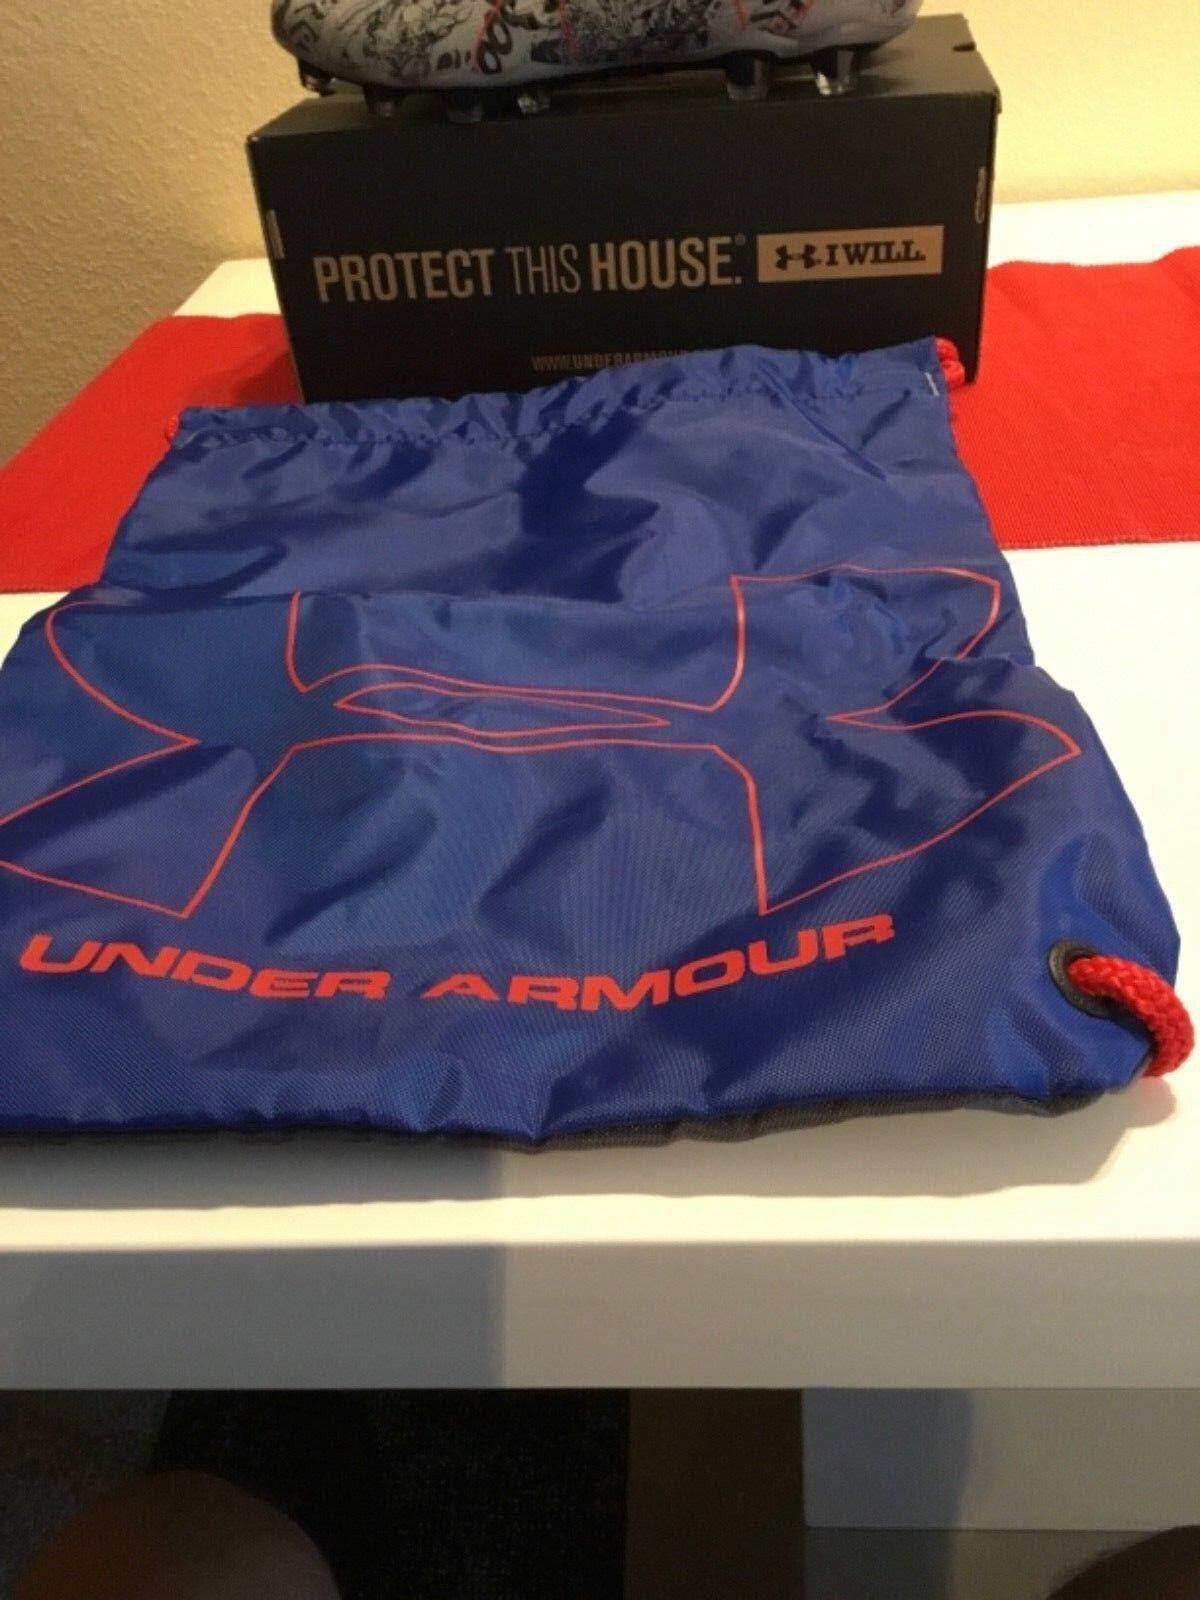 Under Armour ClutchFit Force 2.0 Superman FG Herren Fußballschuhe Fußballschuhe Fußballschuhe Gr wählbar neu 4a2647